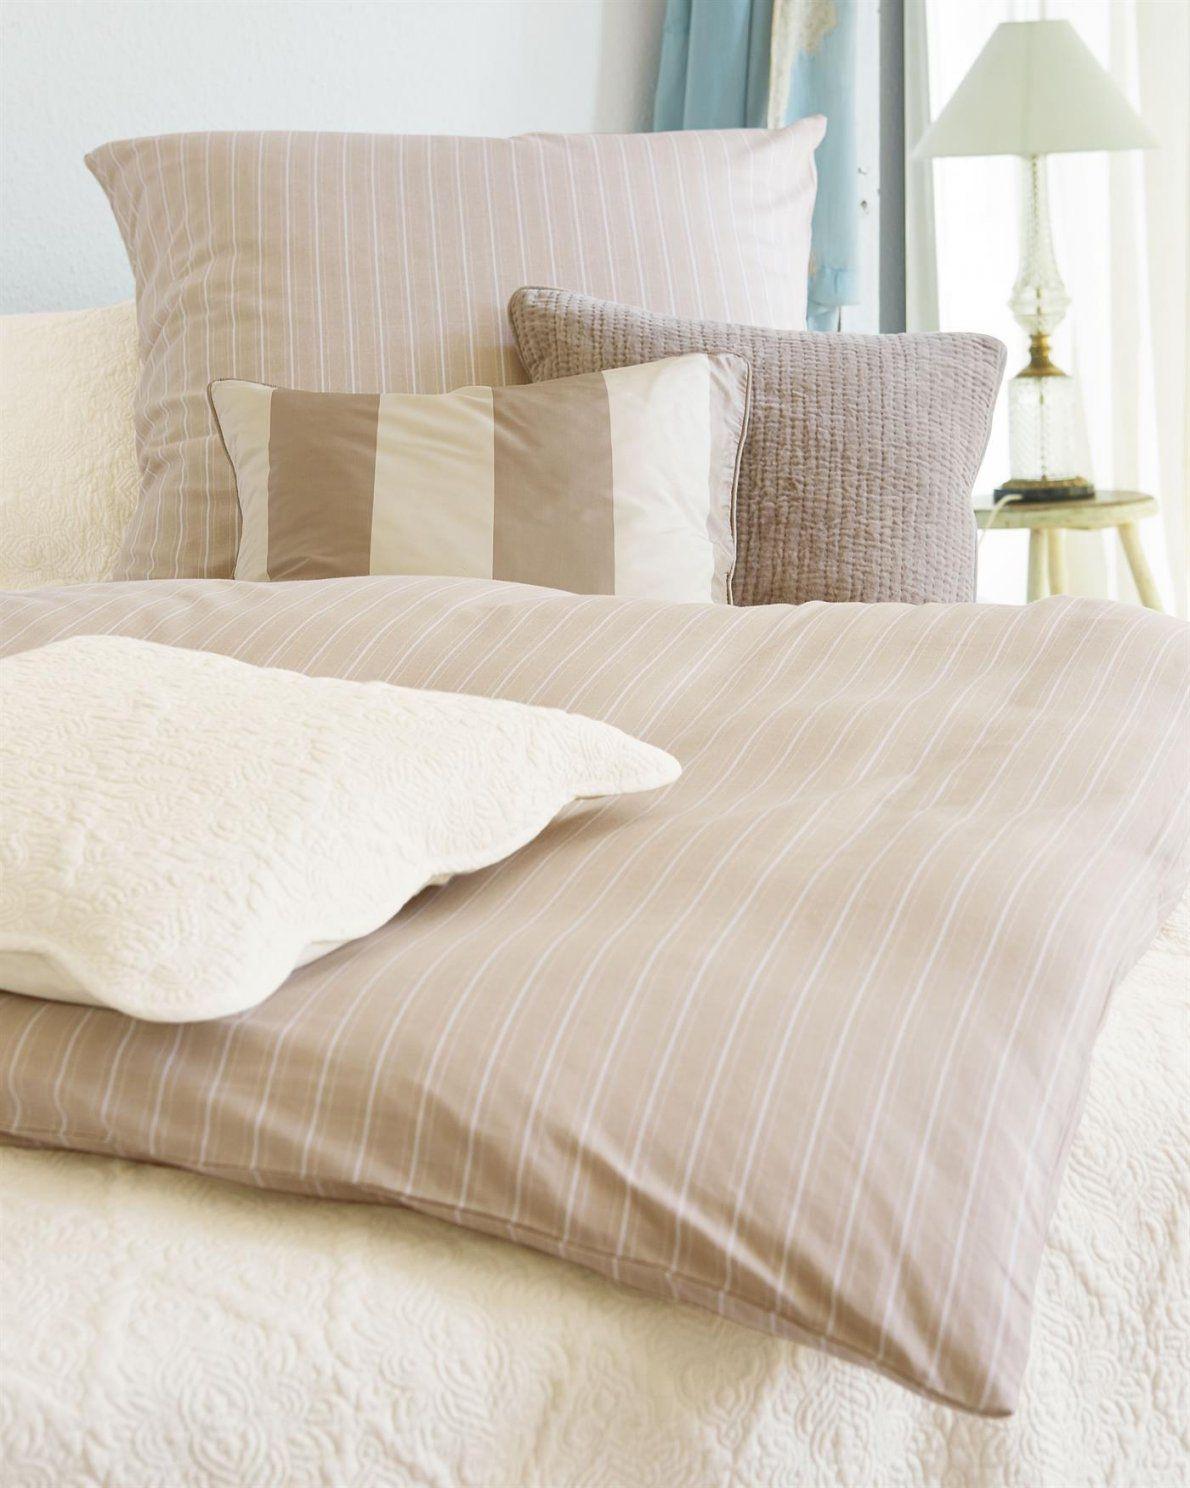 bettw sche rot wei gestreift haus design ideen. Black Bedroom Furniture Sets. Home Design Ideas